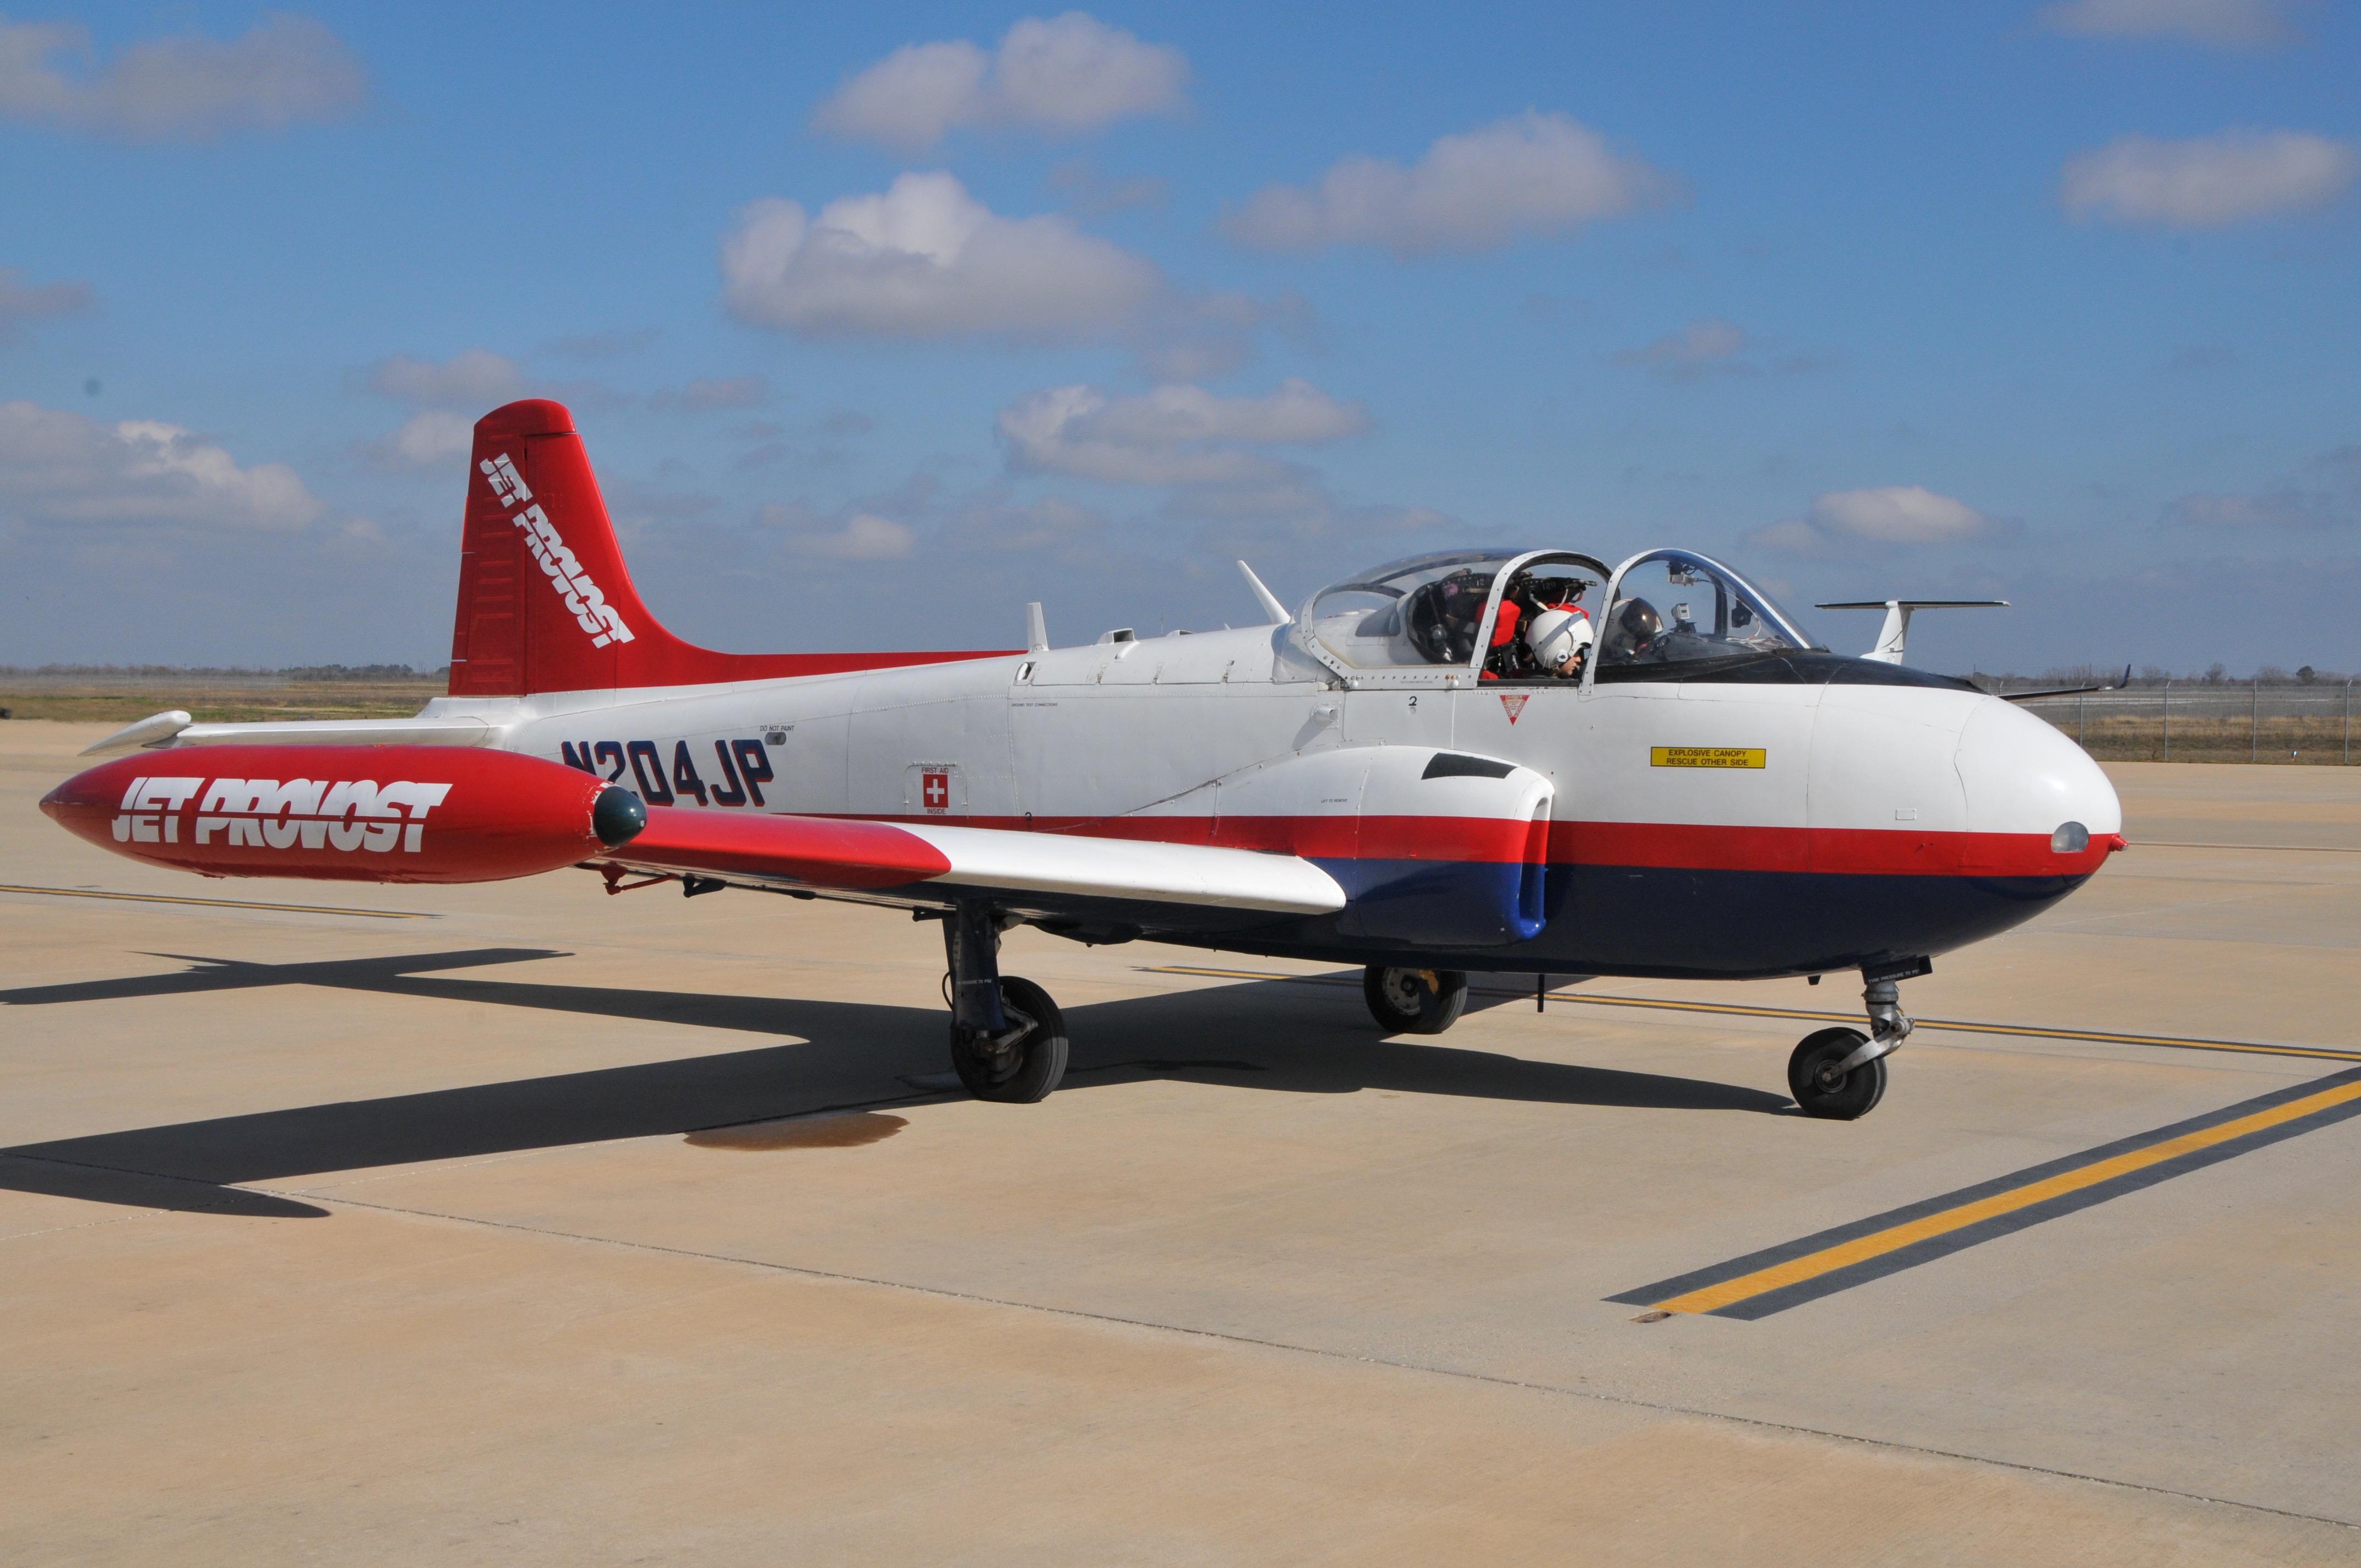 Jean-Luc's Jet Ptrovost